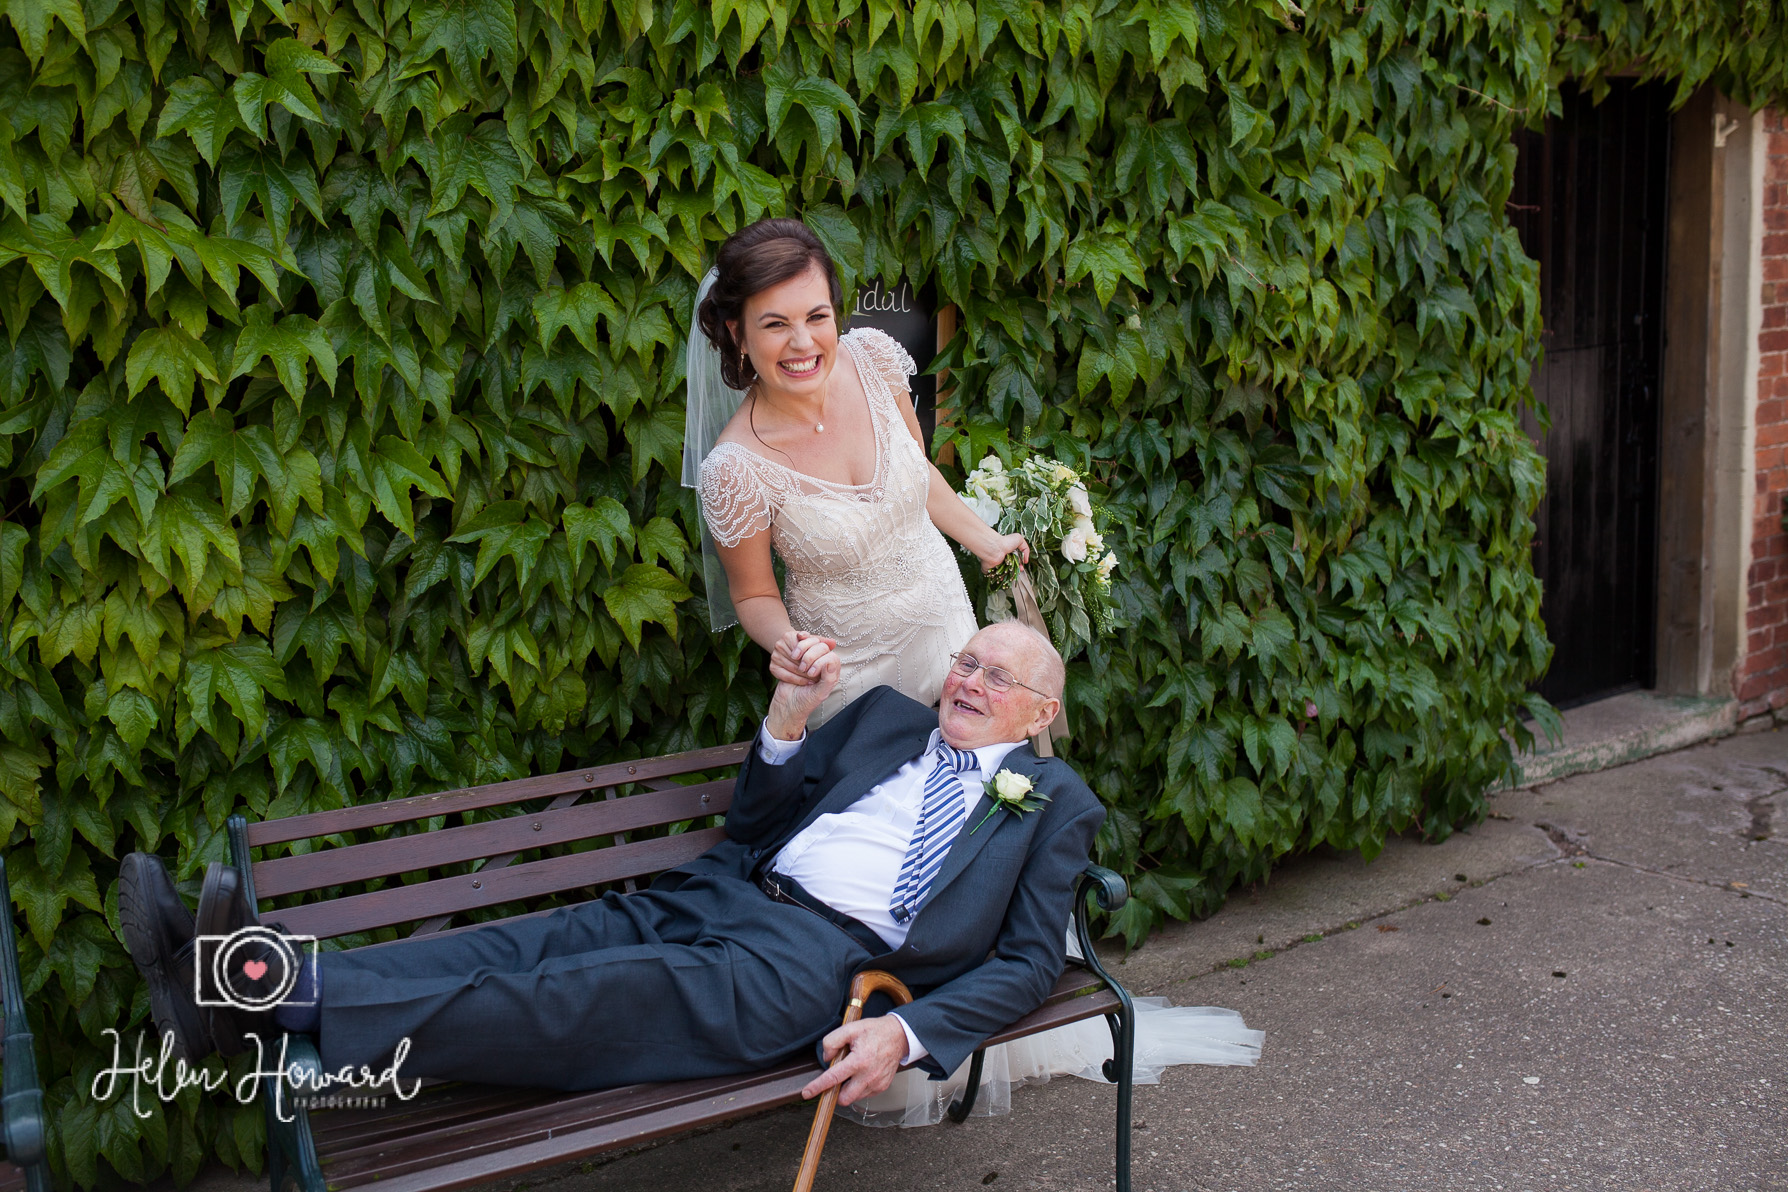 Helen Howard Photography Packington Moor Wedding-72.jpg